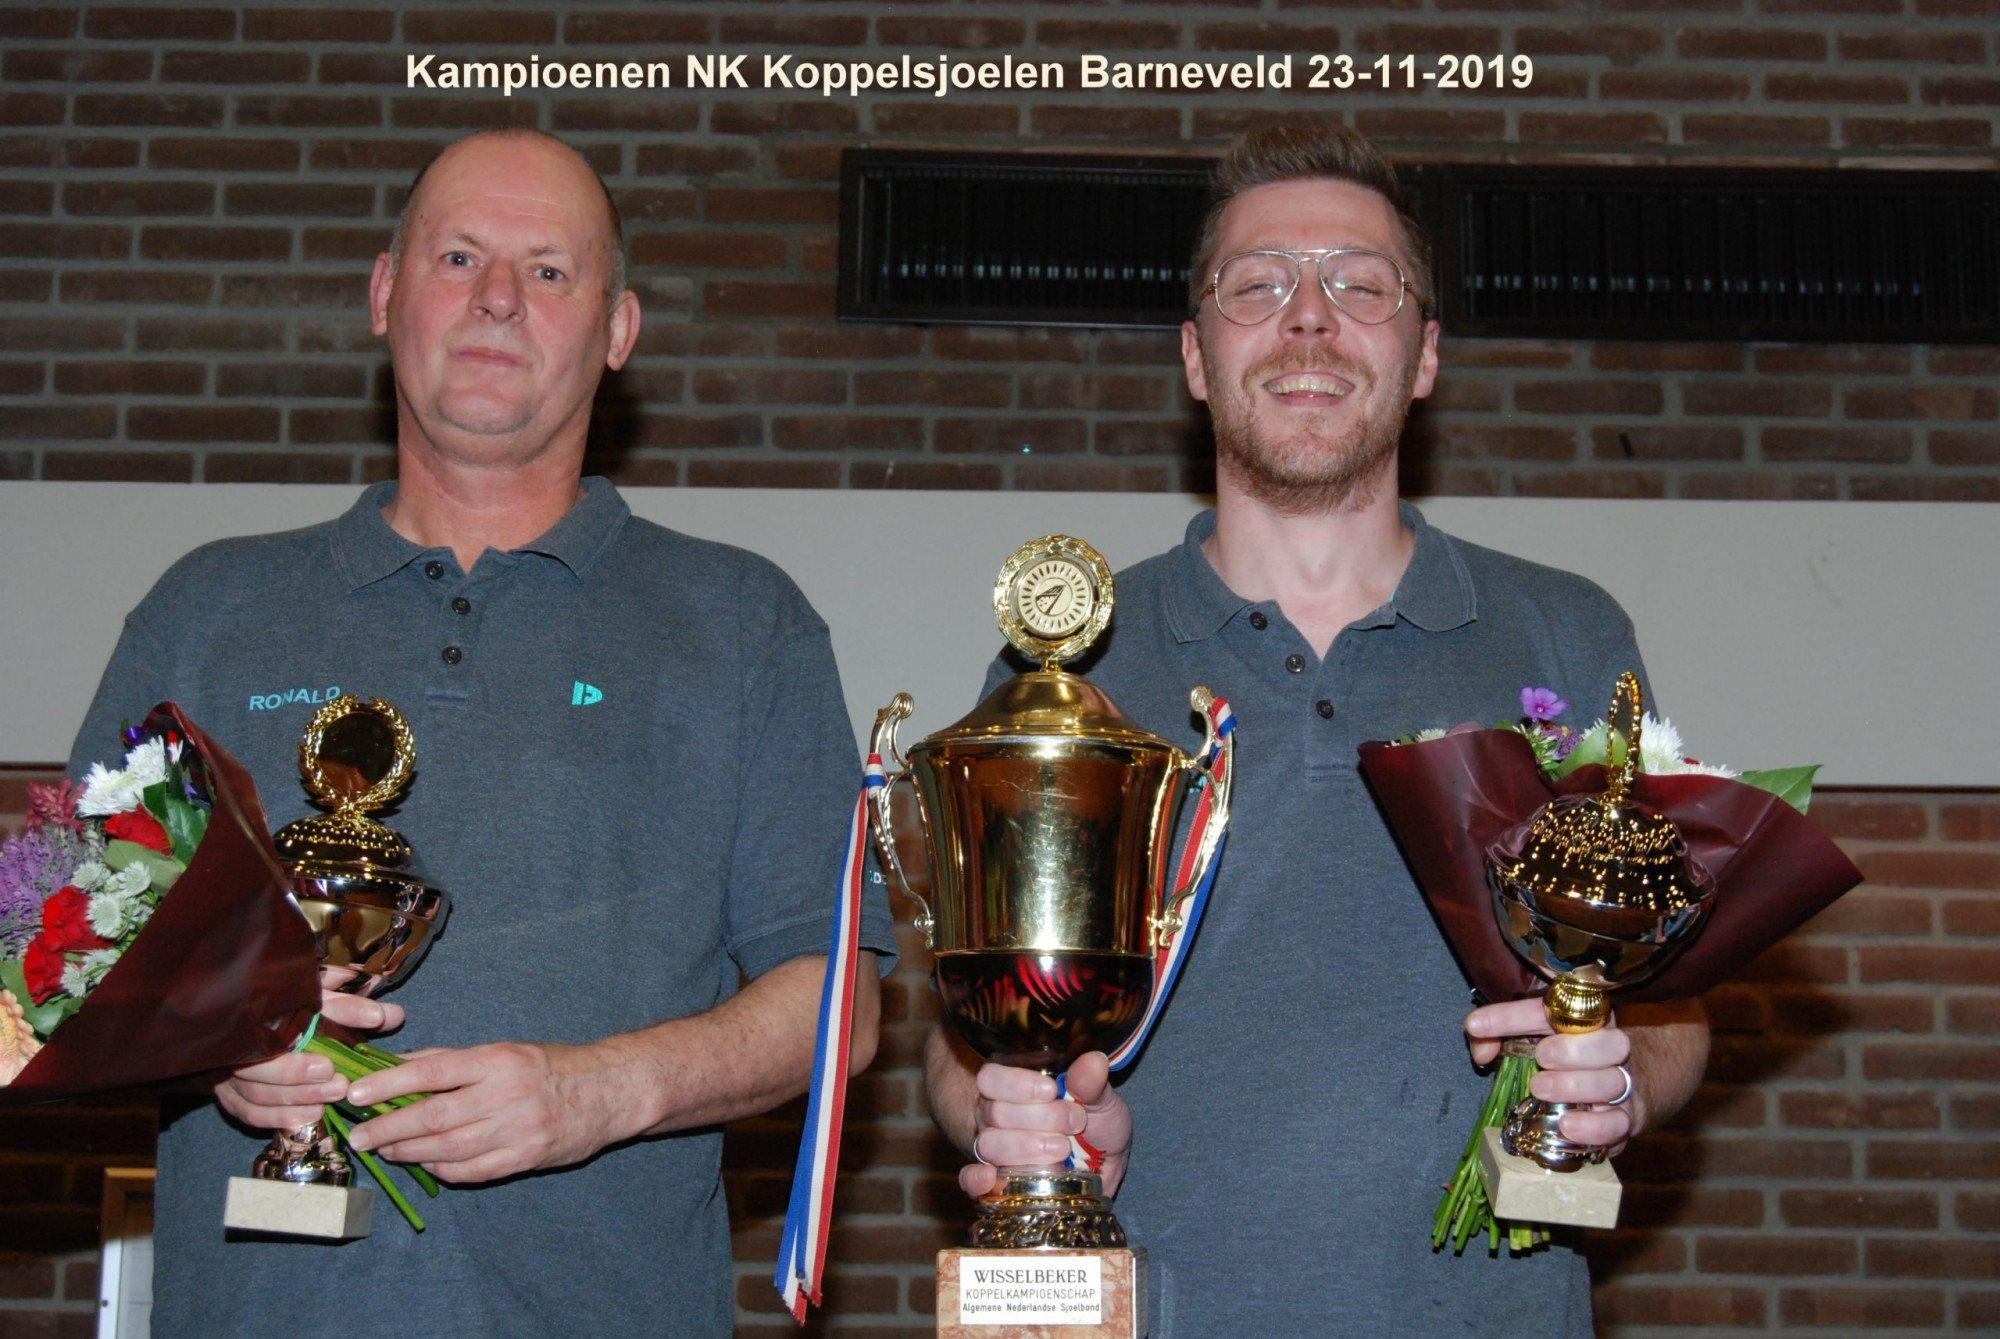 Kampioenen Nederlands Koppelsjoelen 23-11-2019